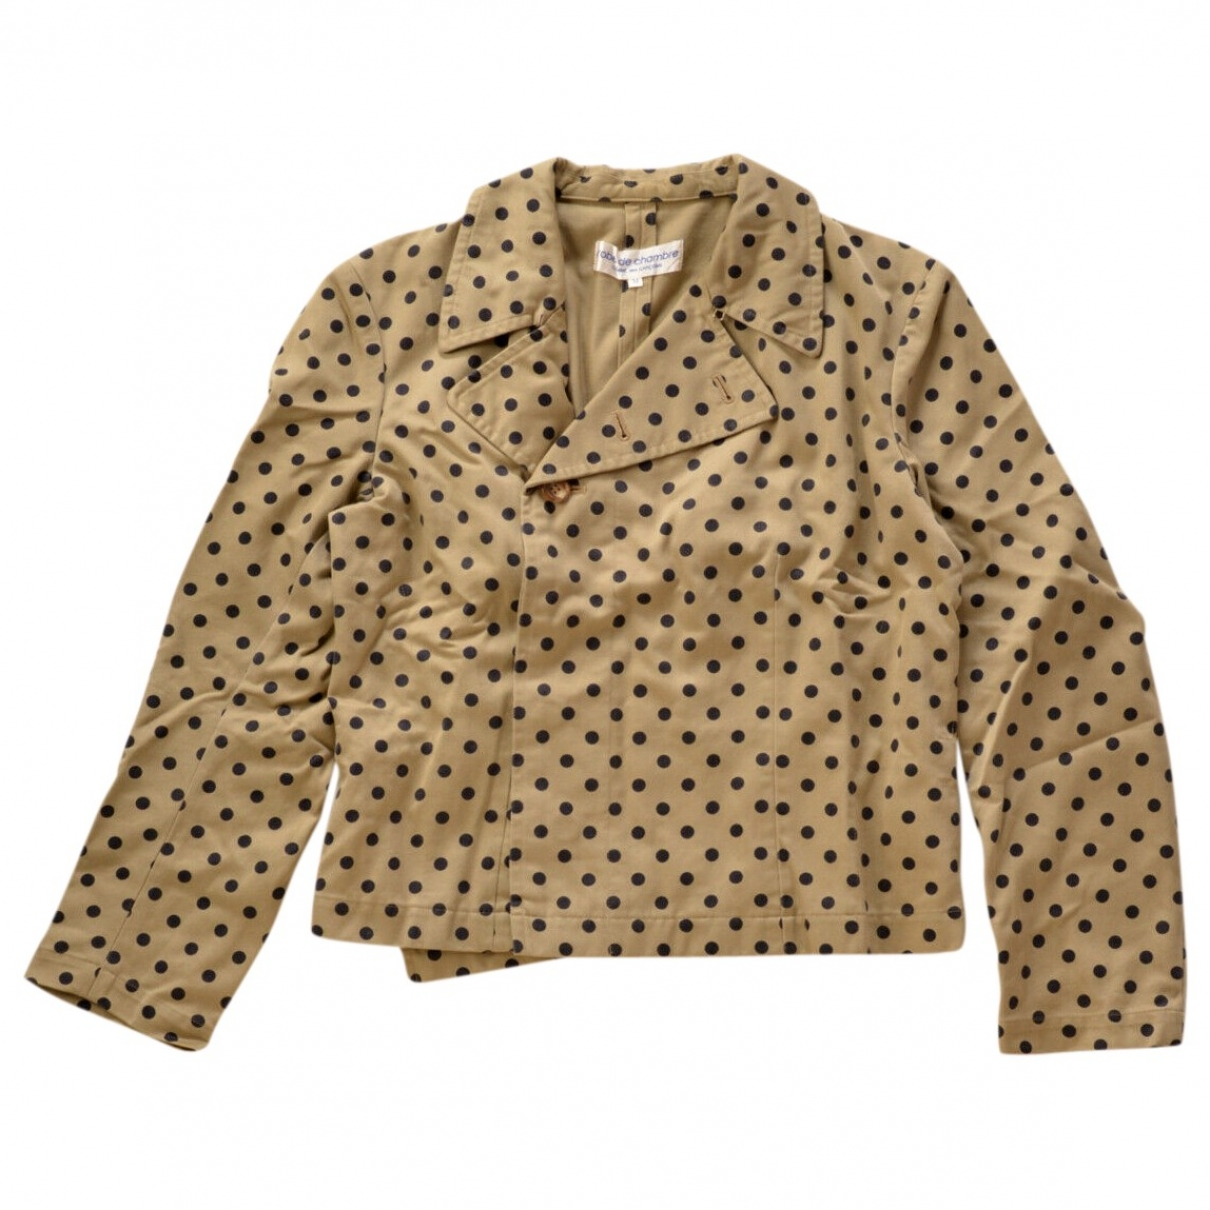 Comme Des Garcons \N Beige Cotton jacket for Women M International